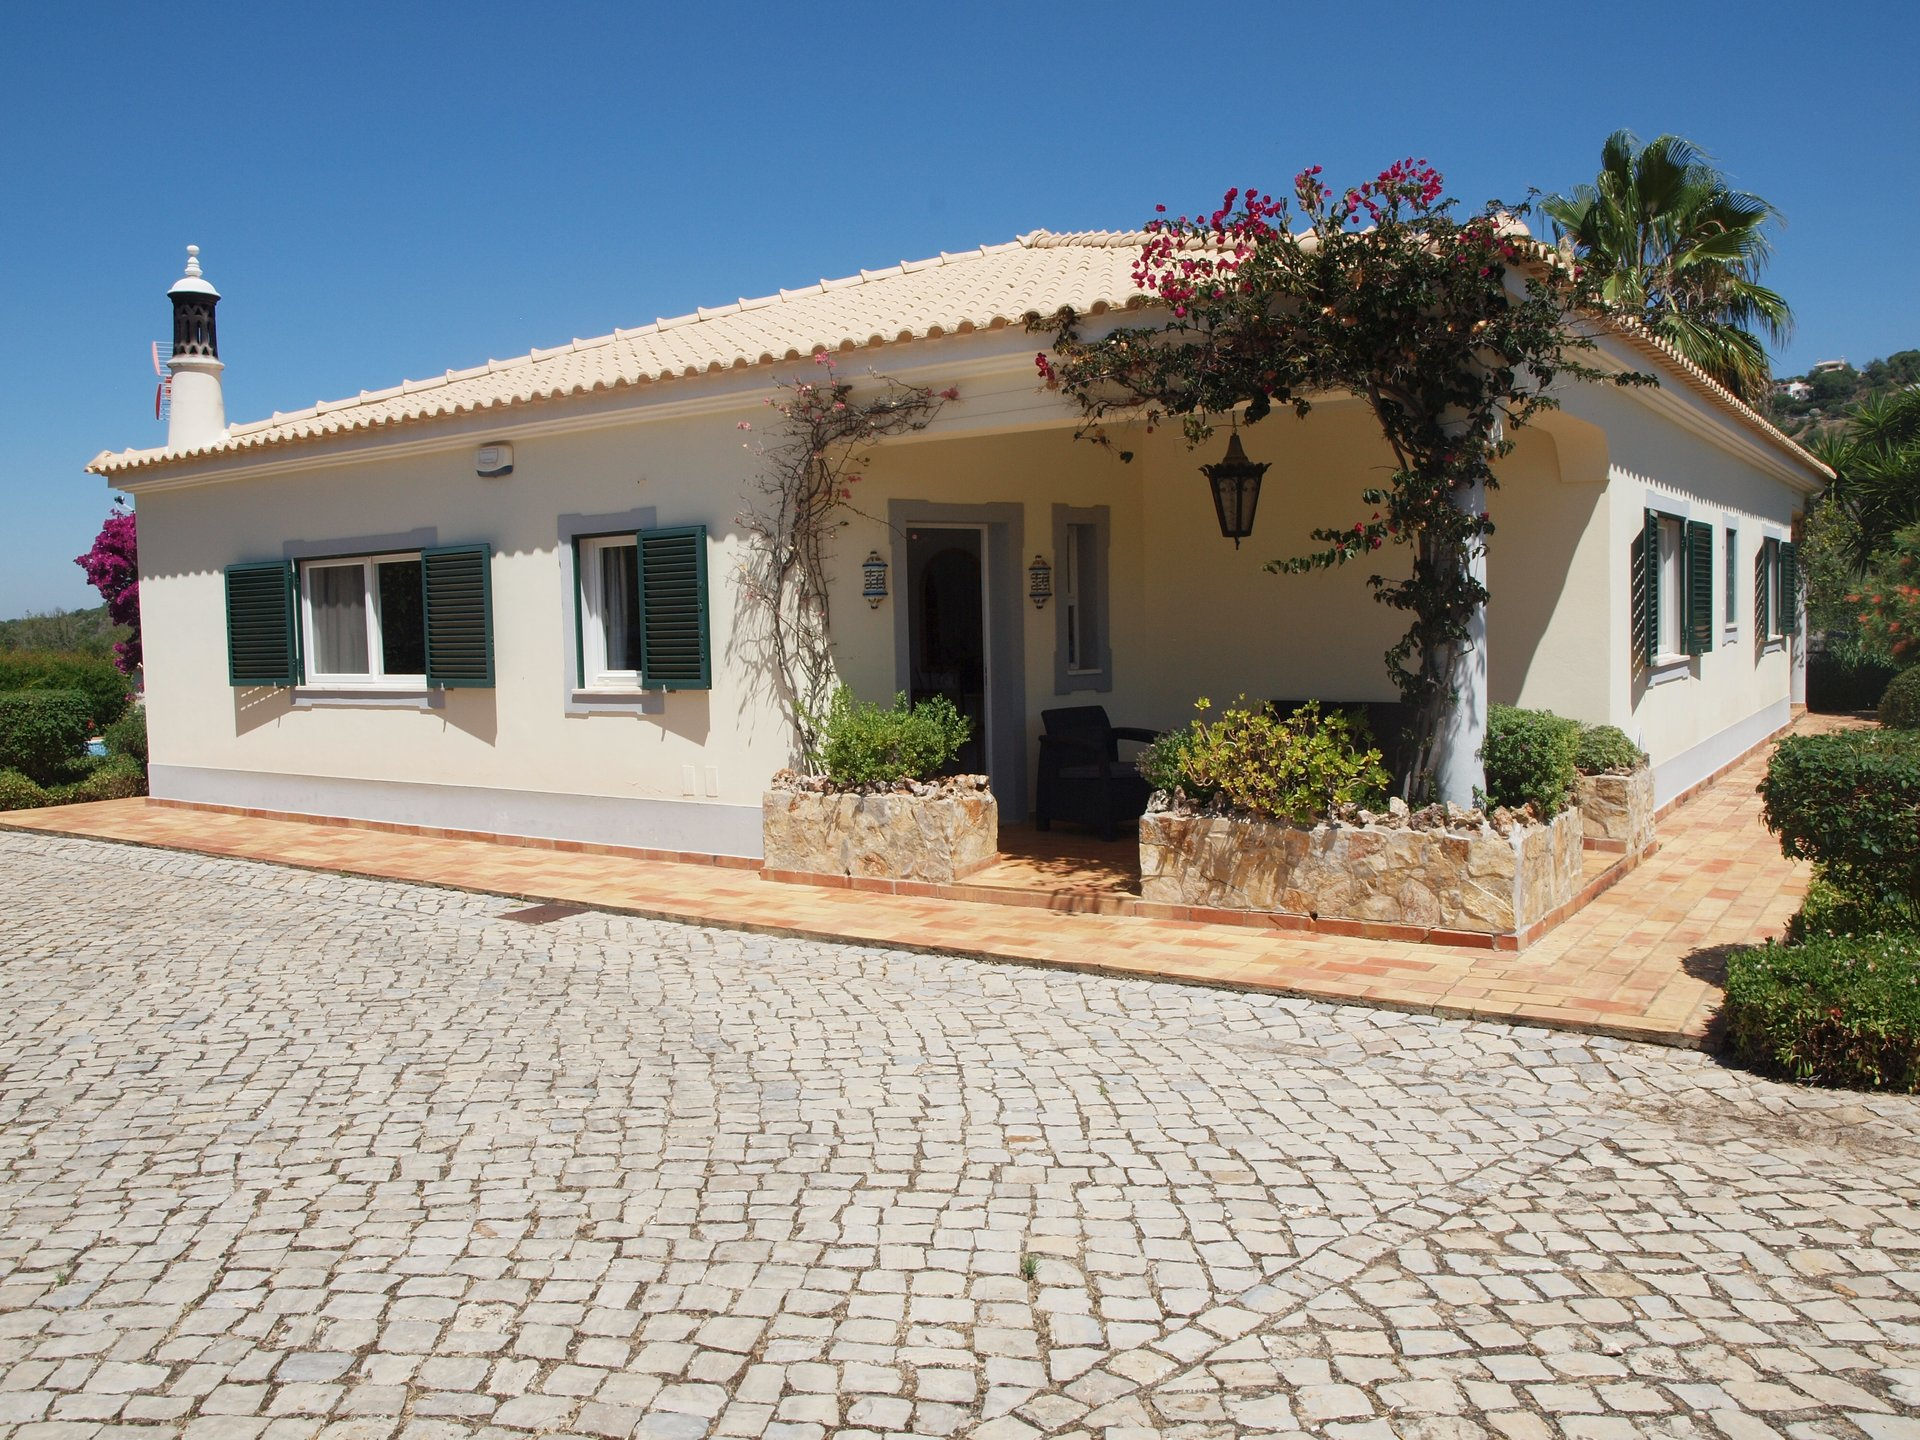 3 Bedroom Villa Loule, Central Algarve Ref: RV5462